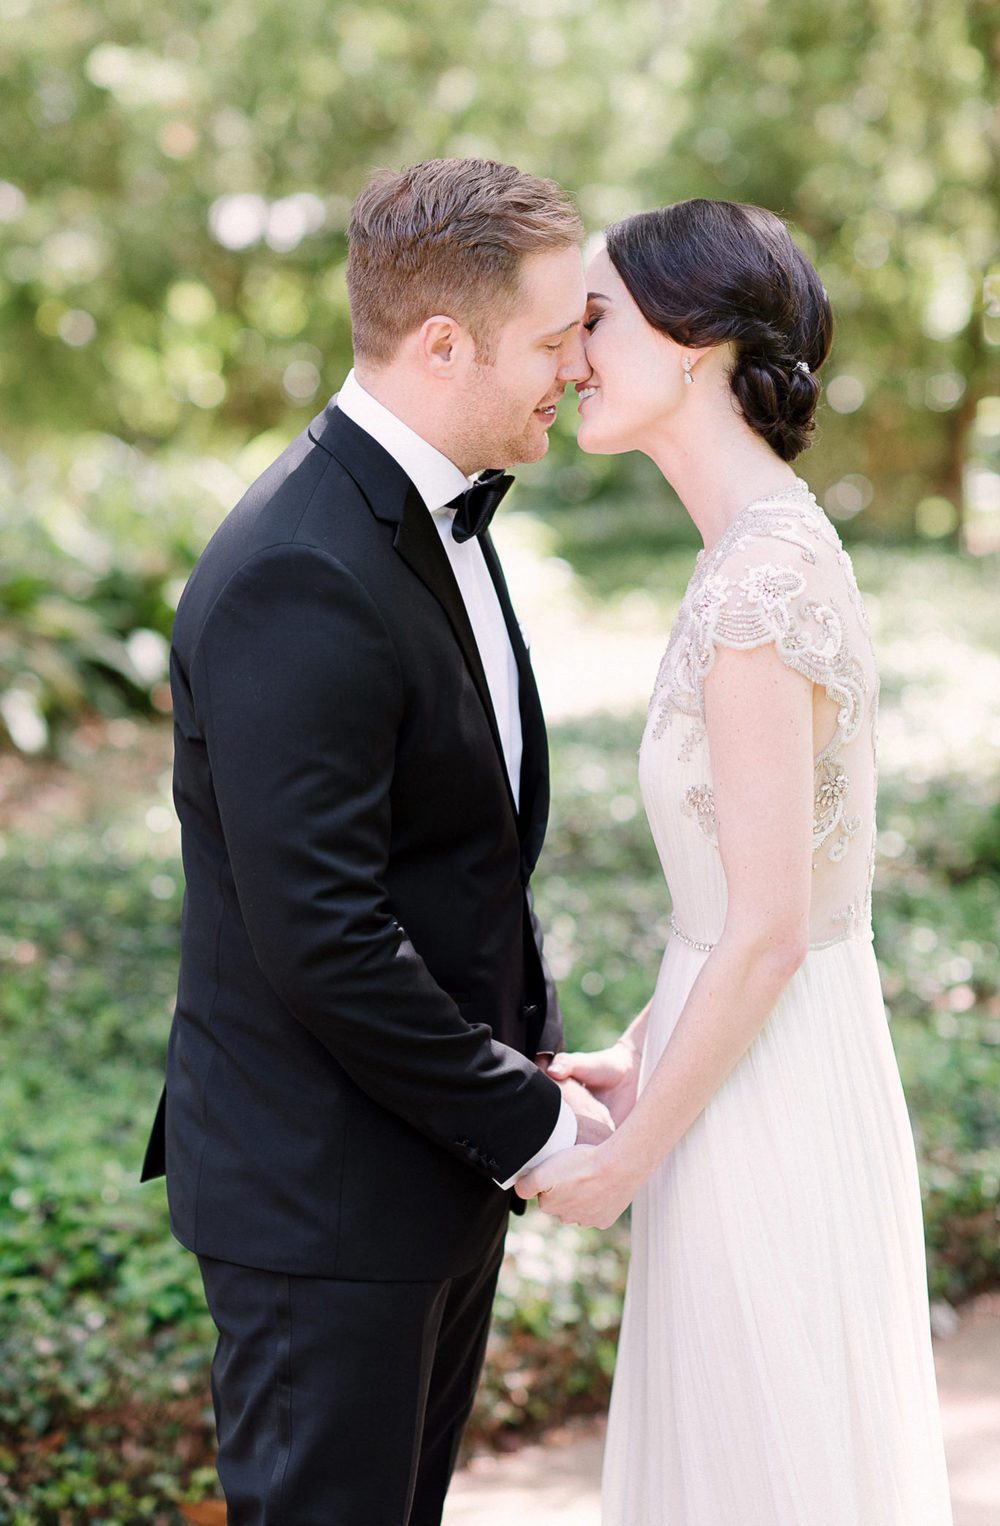 Elegant Bride in BHLDN Gown